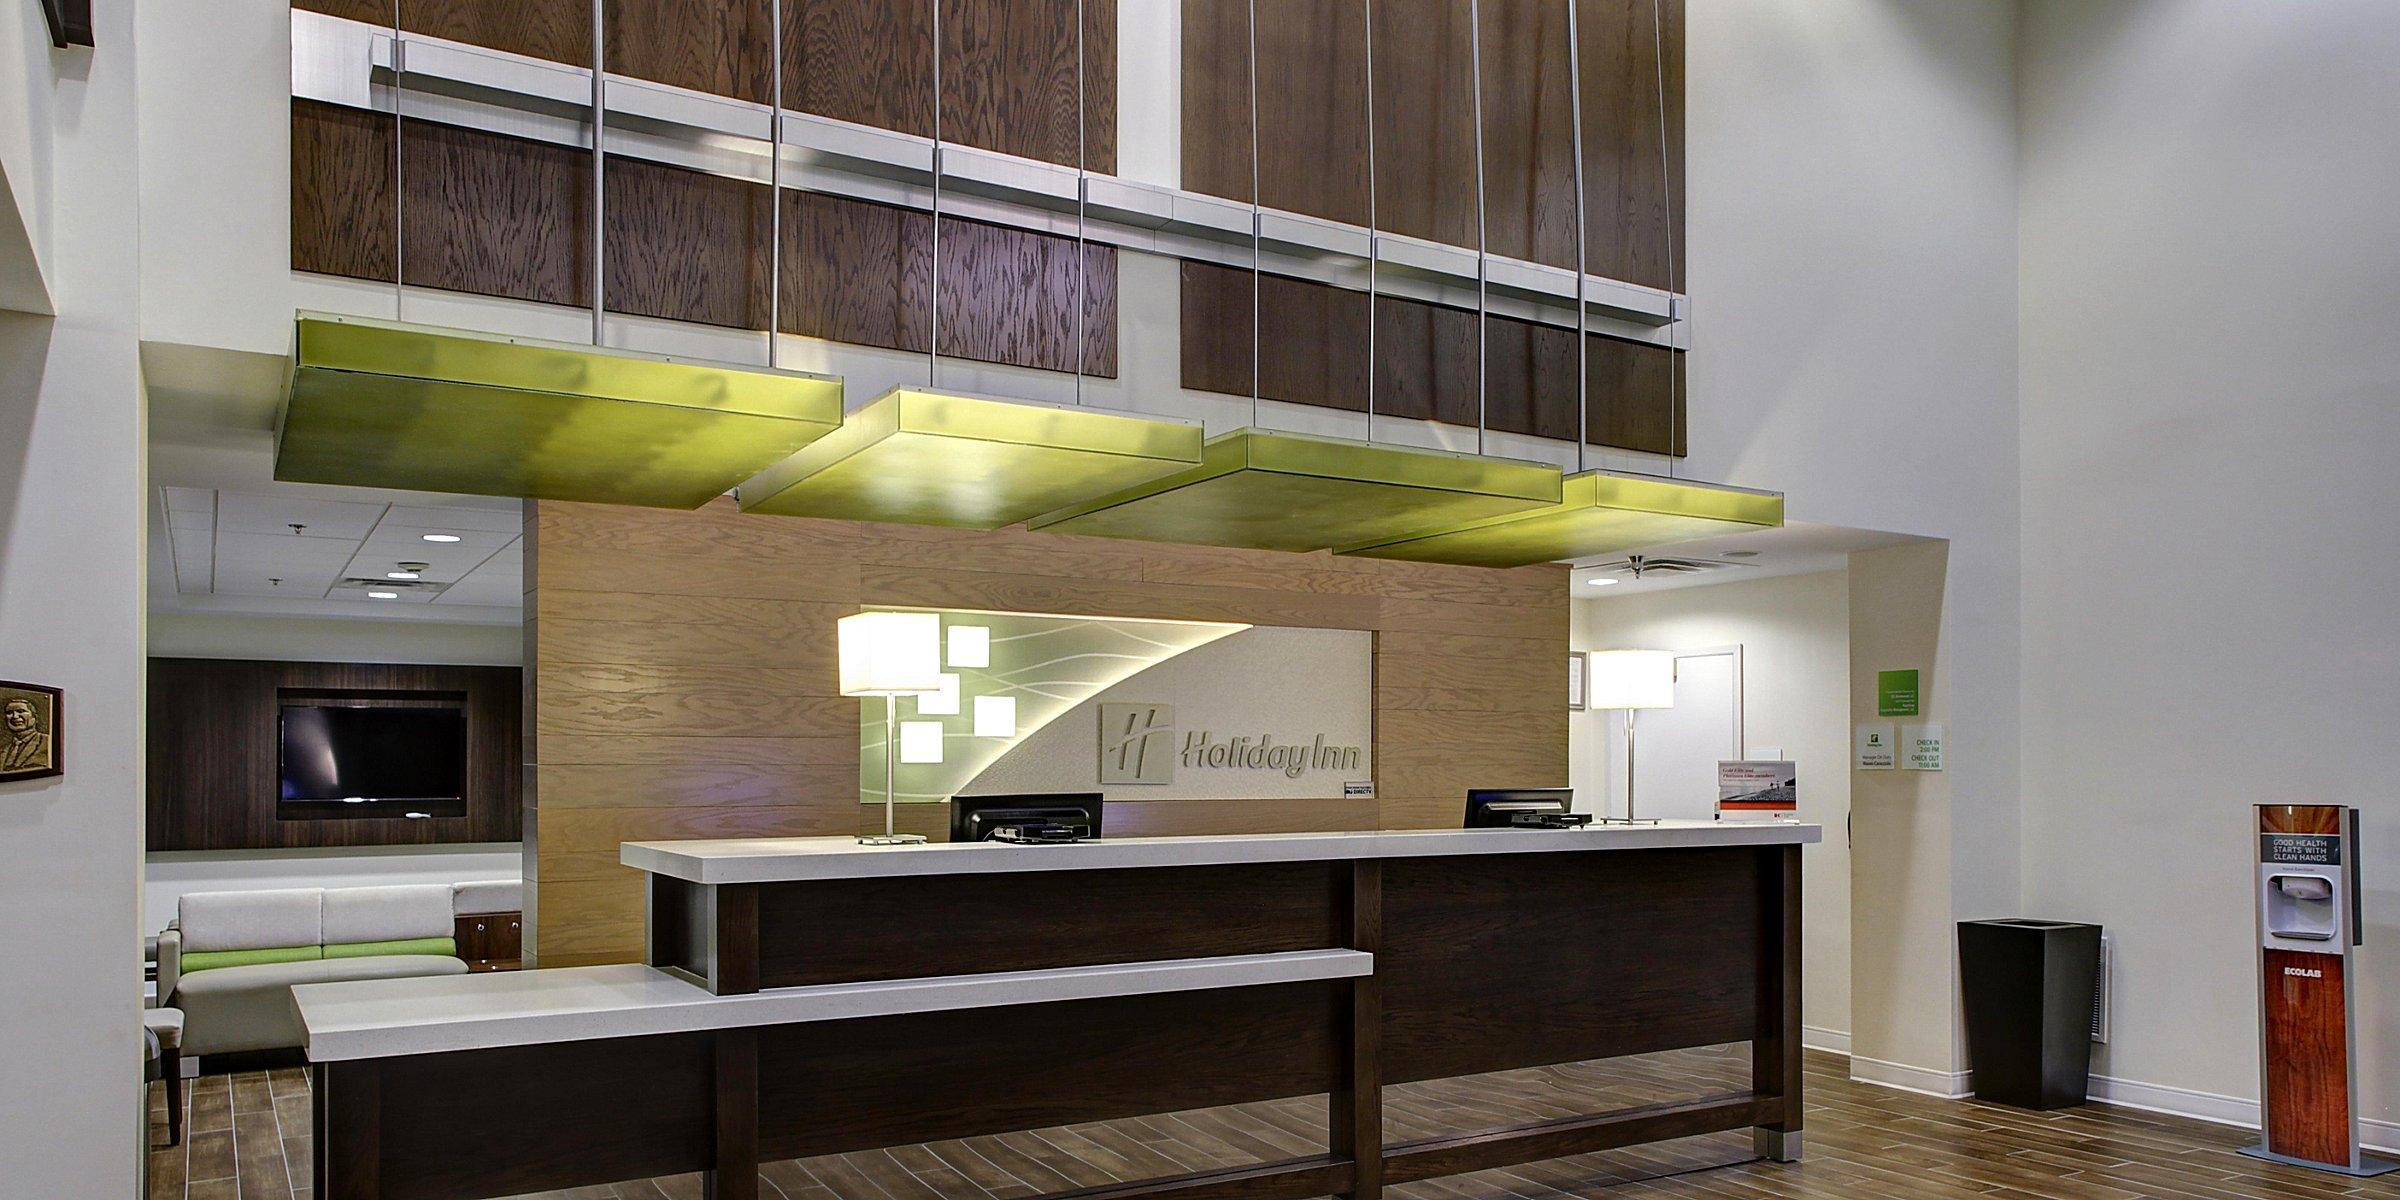 Kid & Pet Friendly Hotels Near Nashville | Holiday Inn